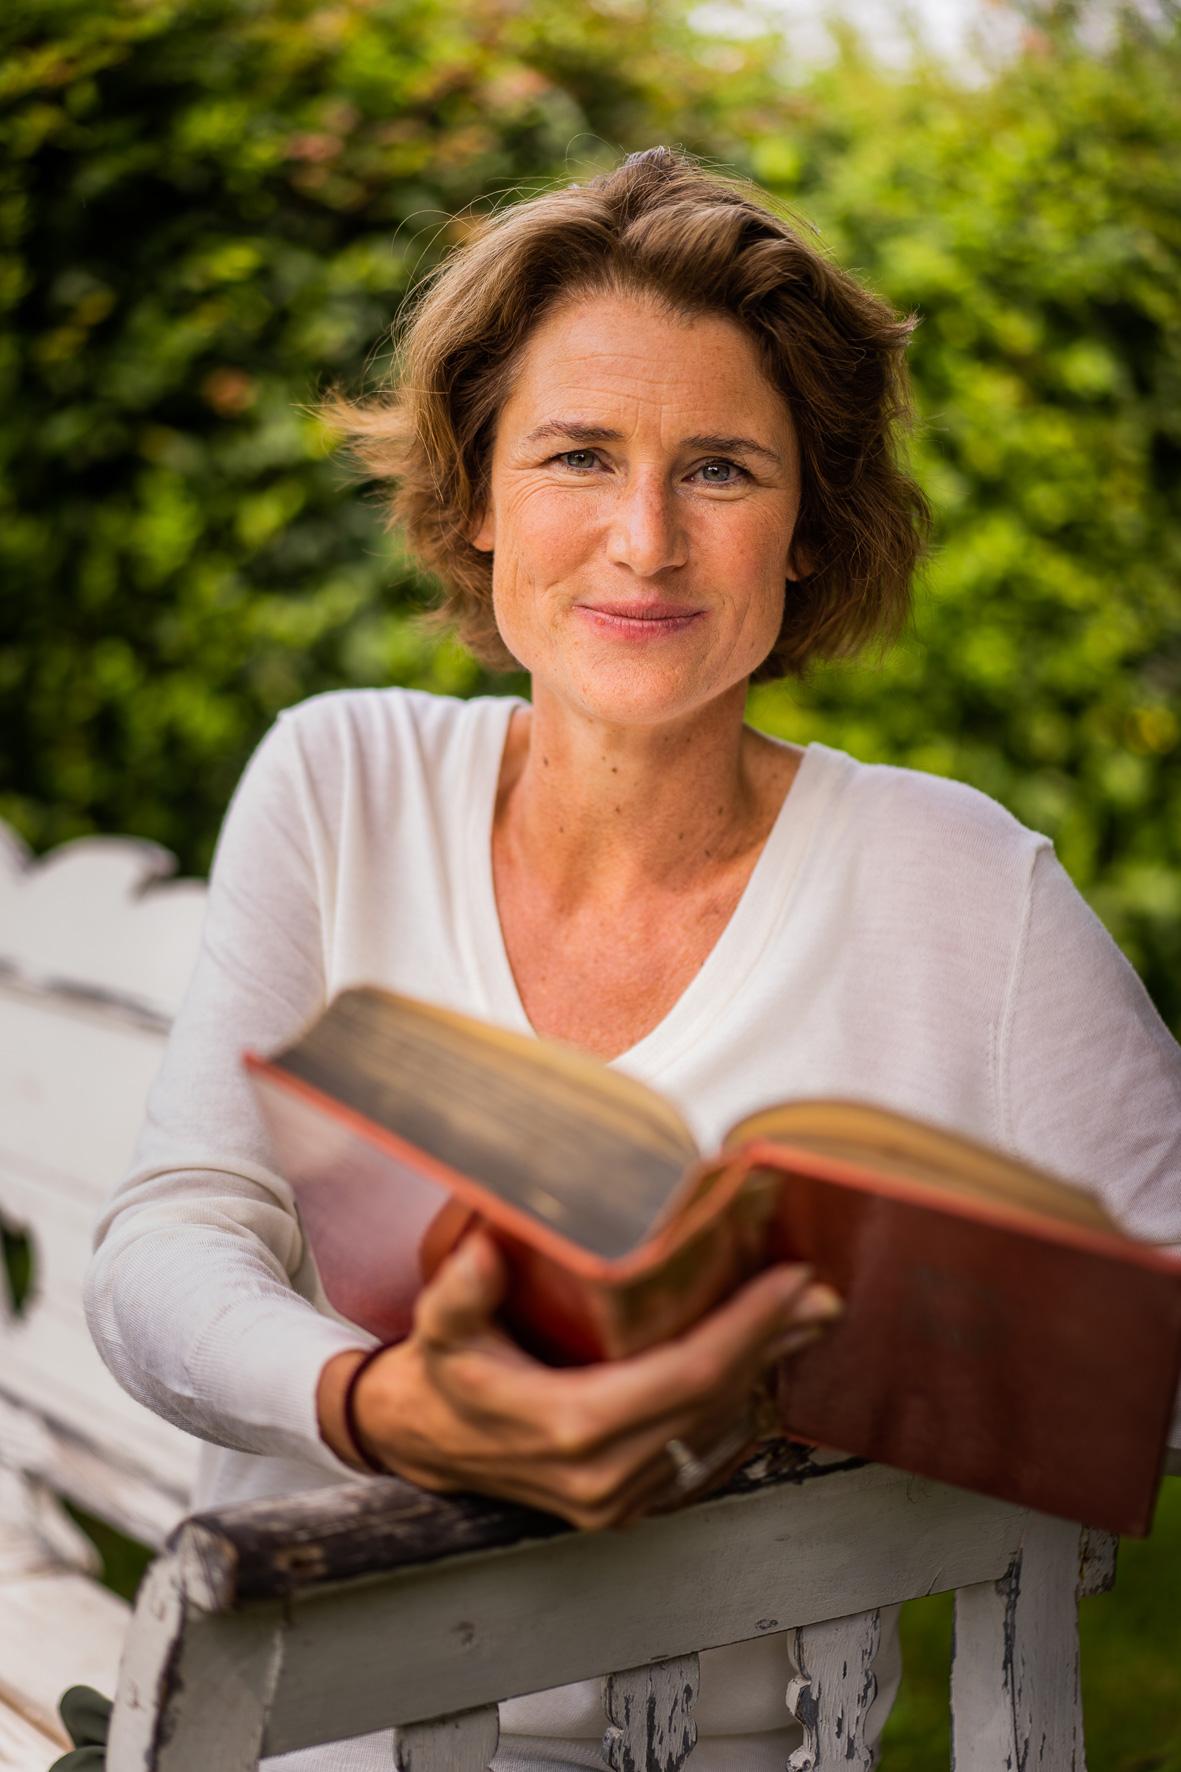 Auteru Manon Duintjer, foto: Wouter Keuris Fotografie